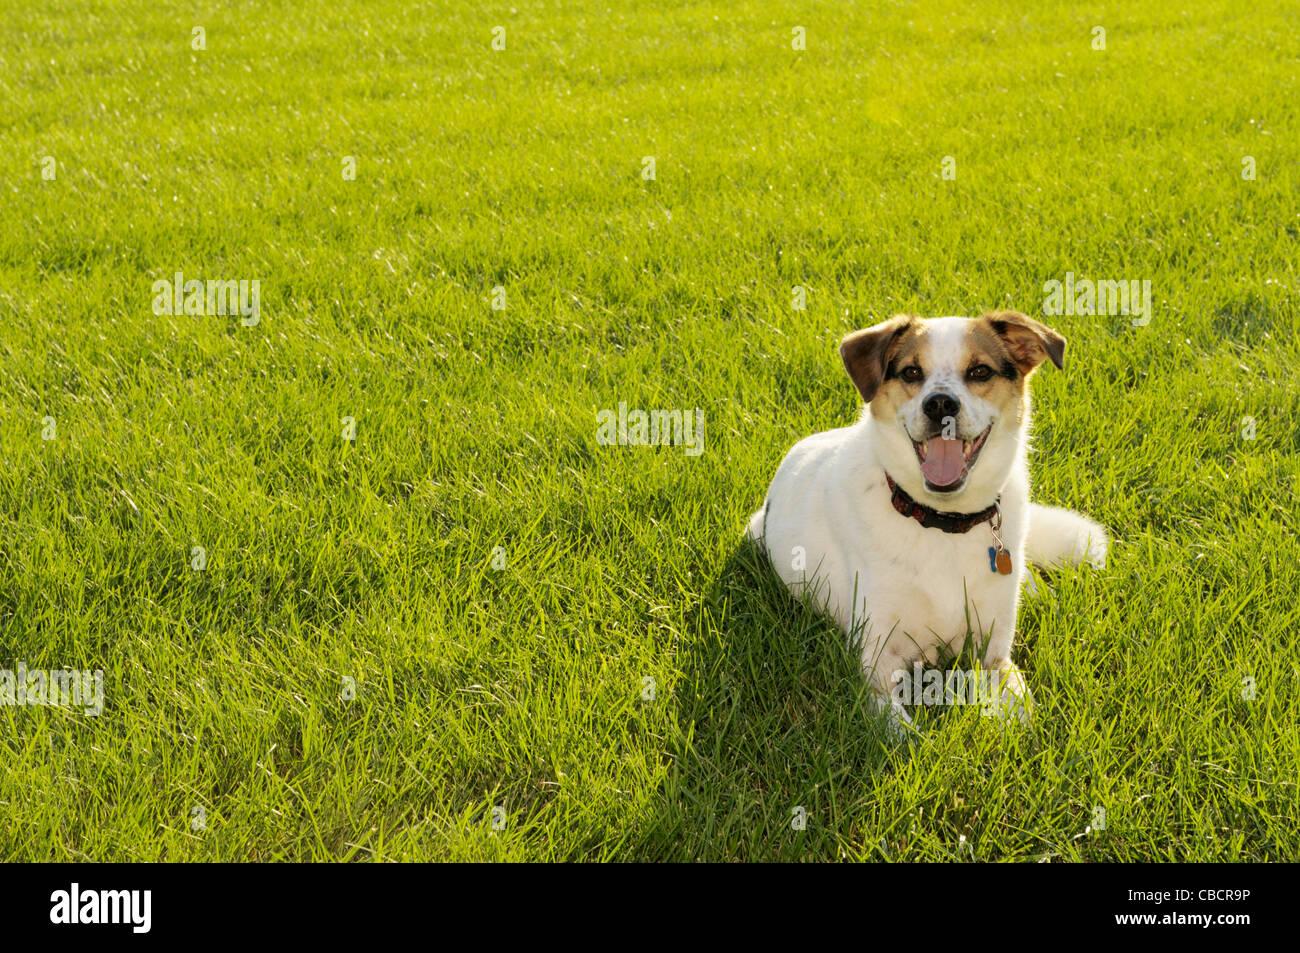 Dog on backlit field in summer - Stock Image